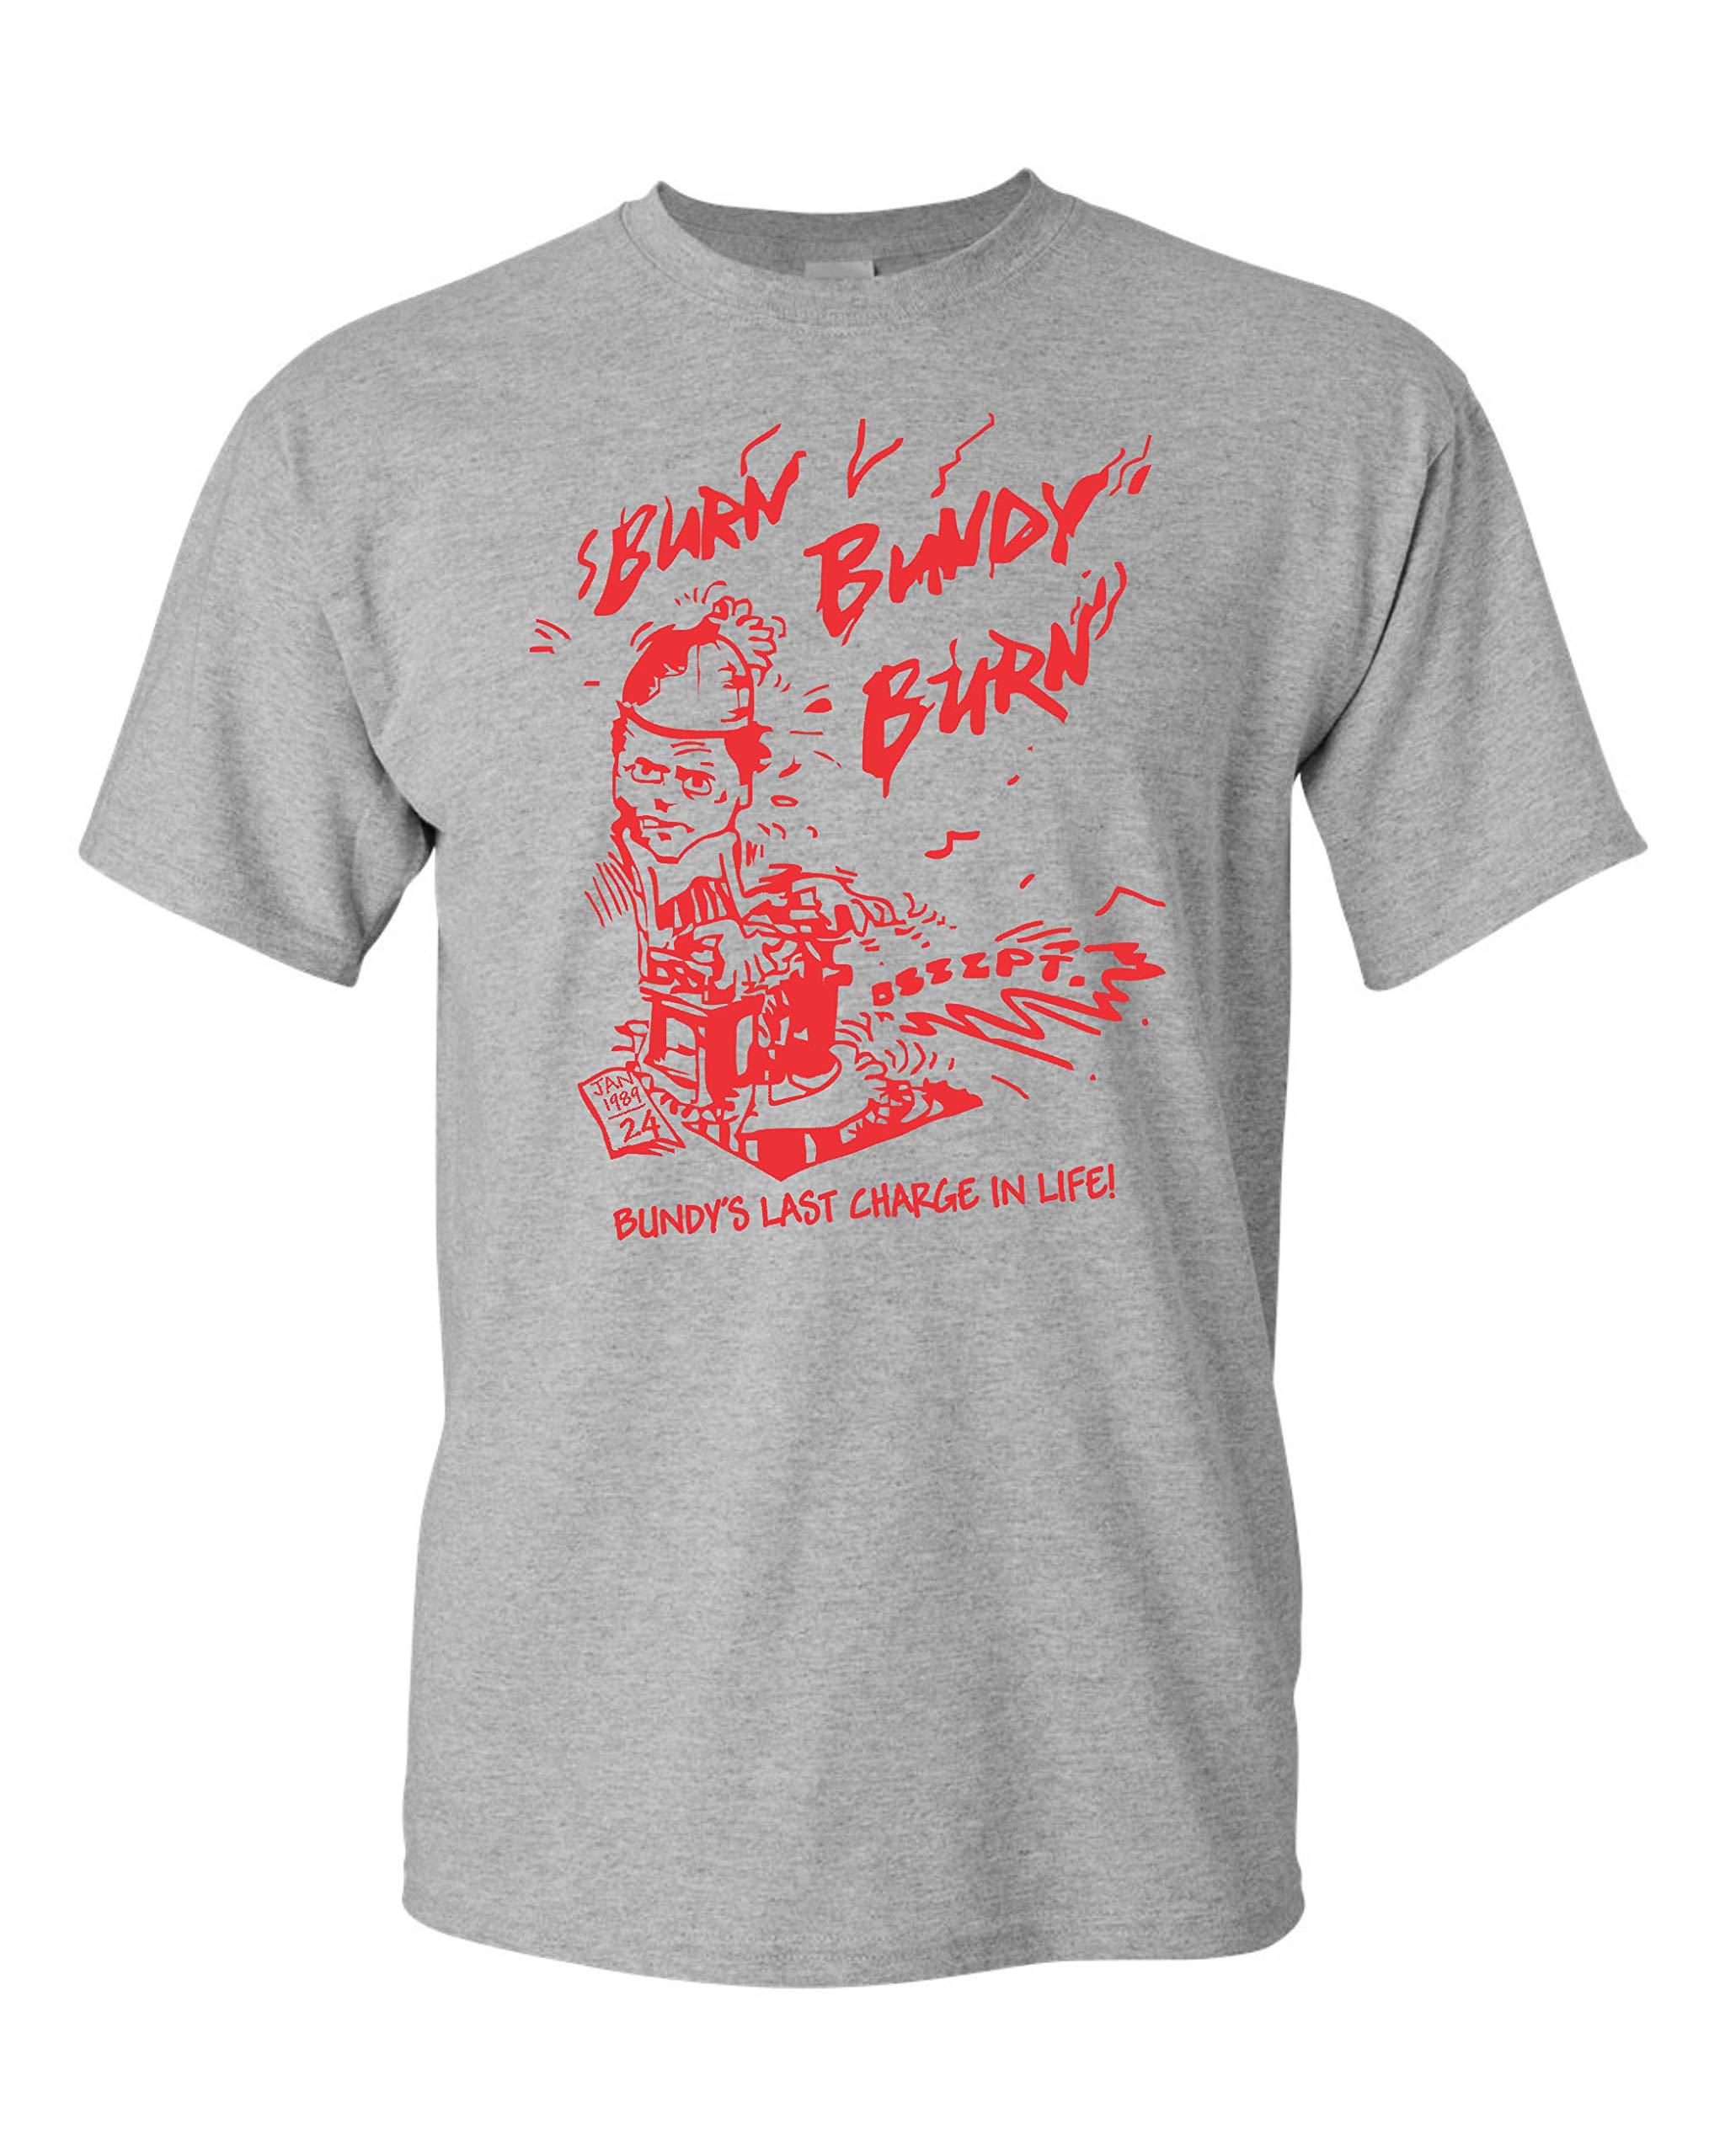 All Things Apparel Burn Bundy Burn Ted Bundy Execution T Shirt 2295